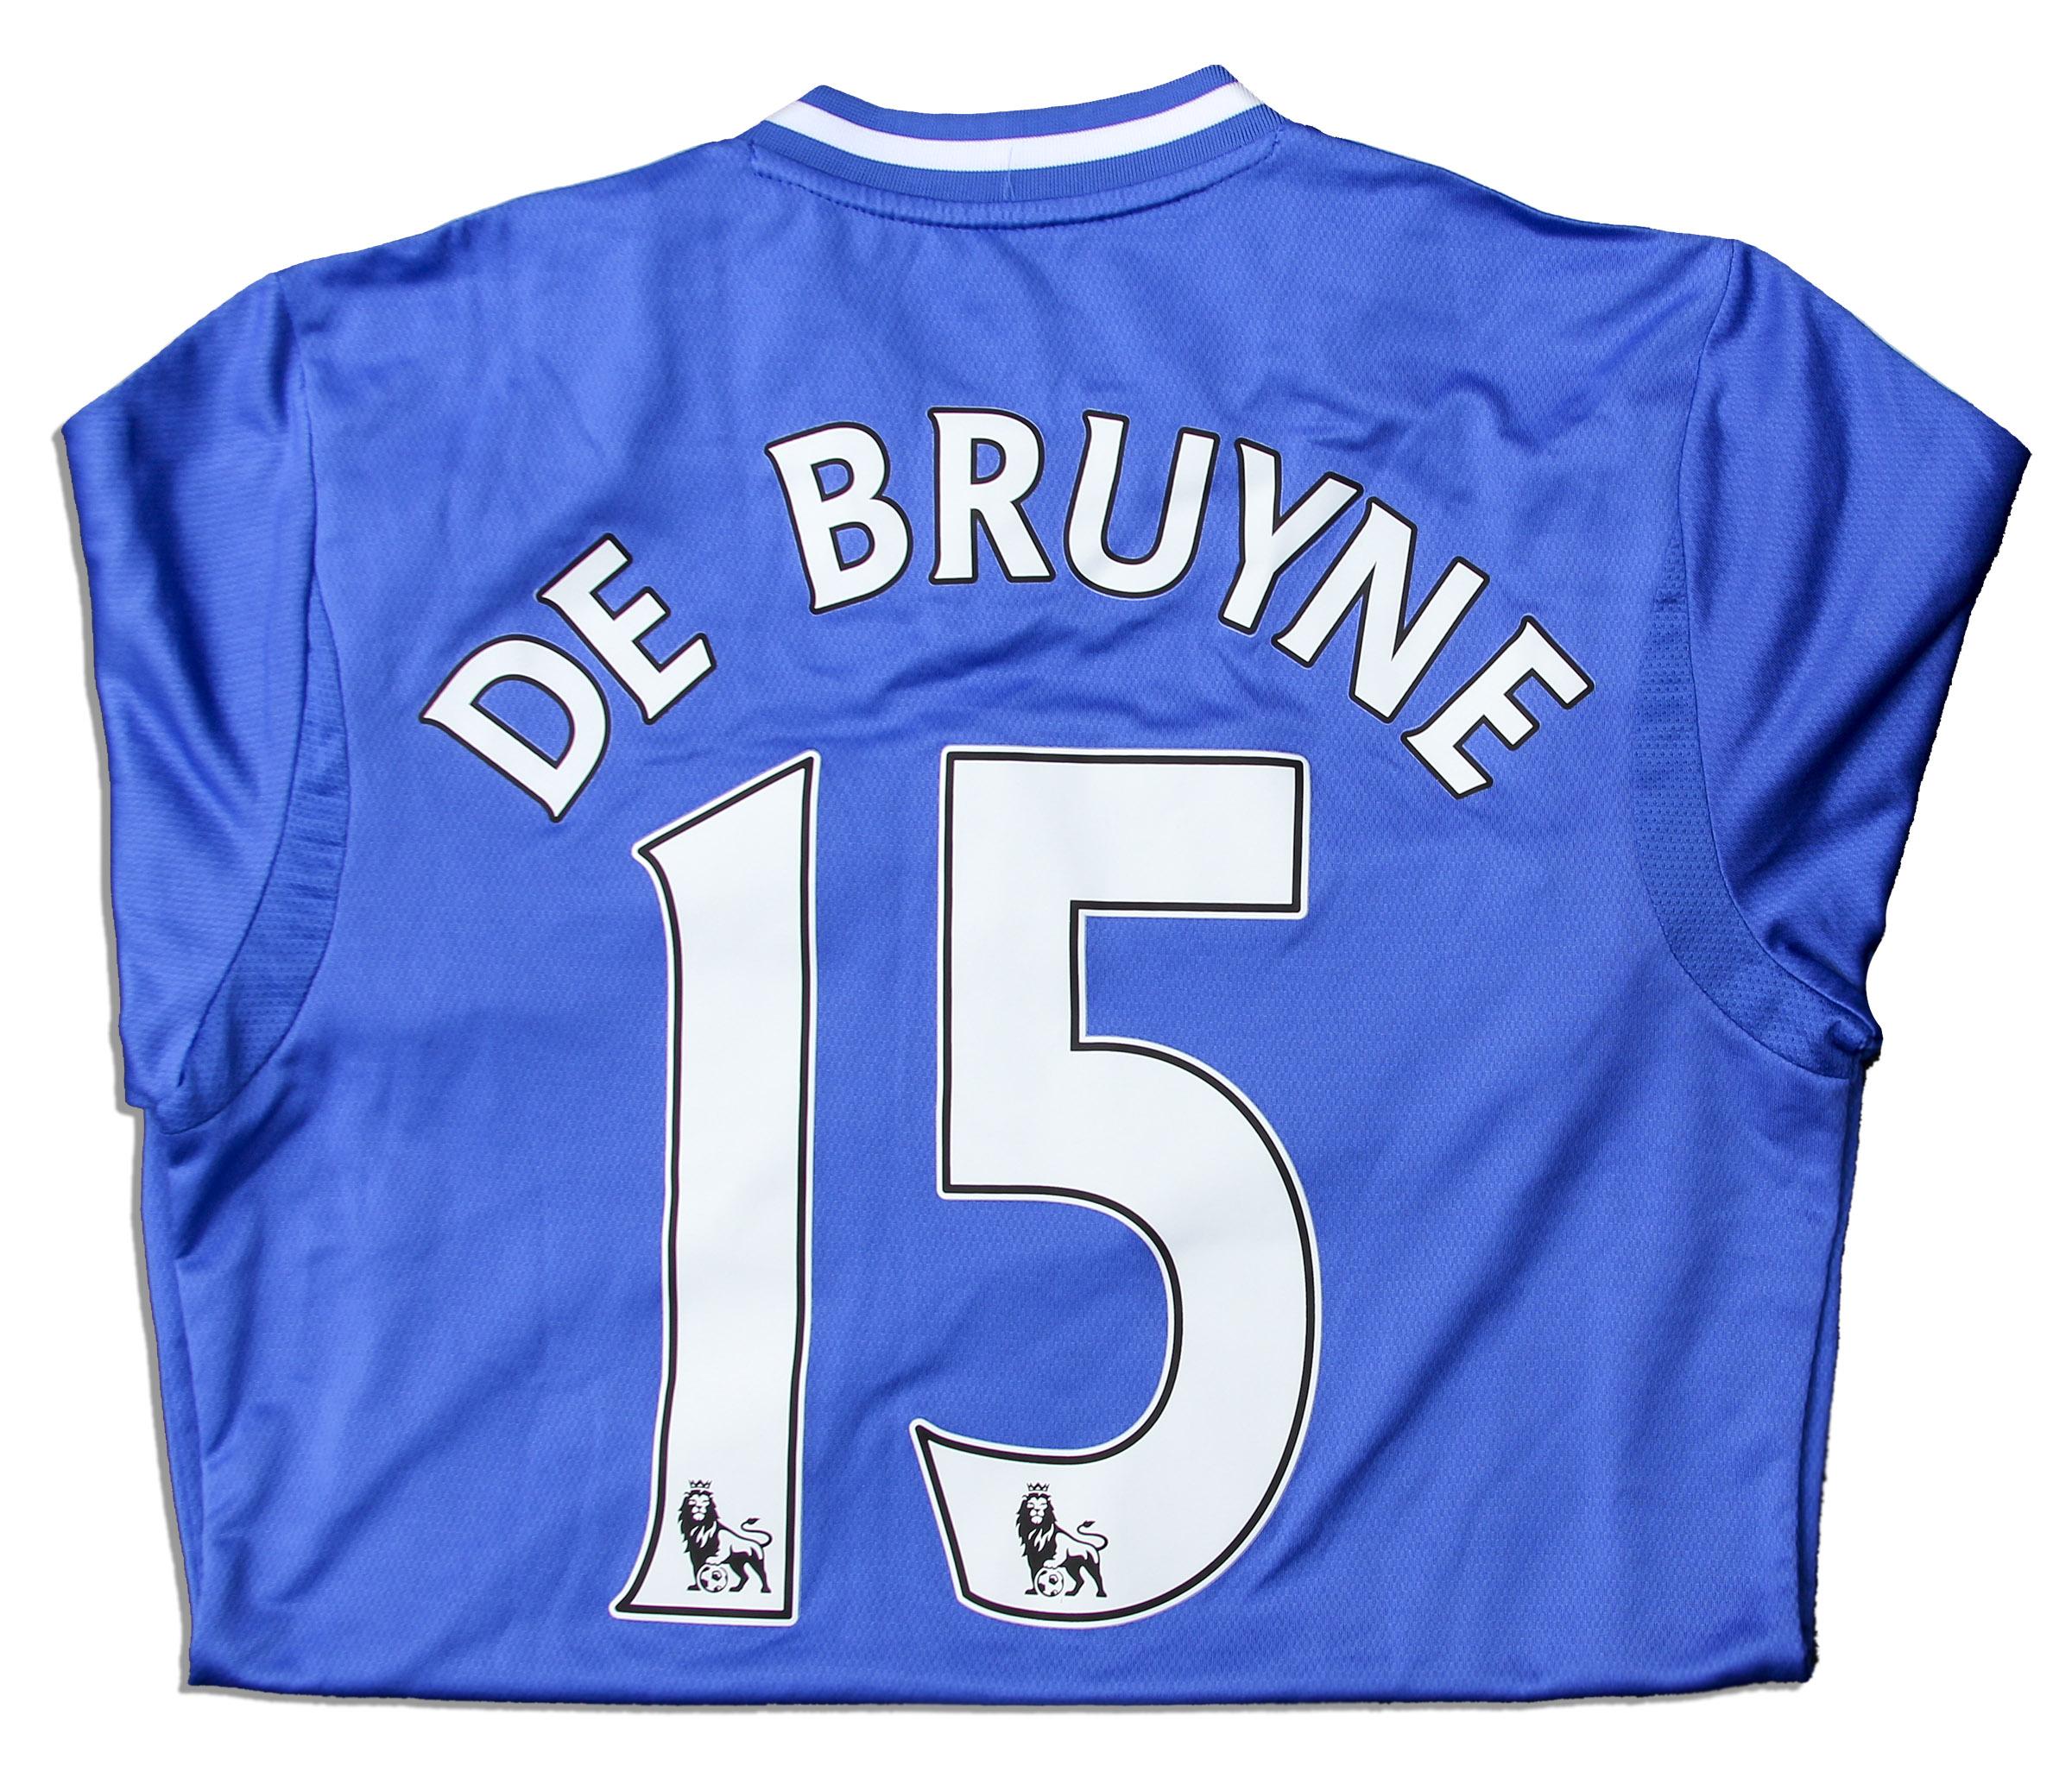 big sale 67f0b 3048a Lot Detail - Kevin De Bruyne Match Worn Chelsea Football ...